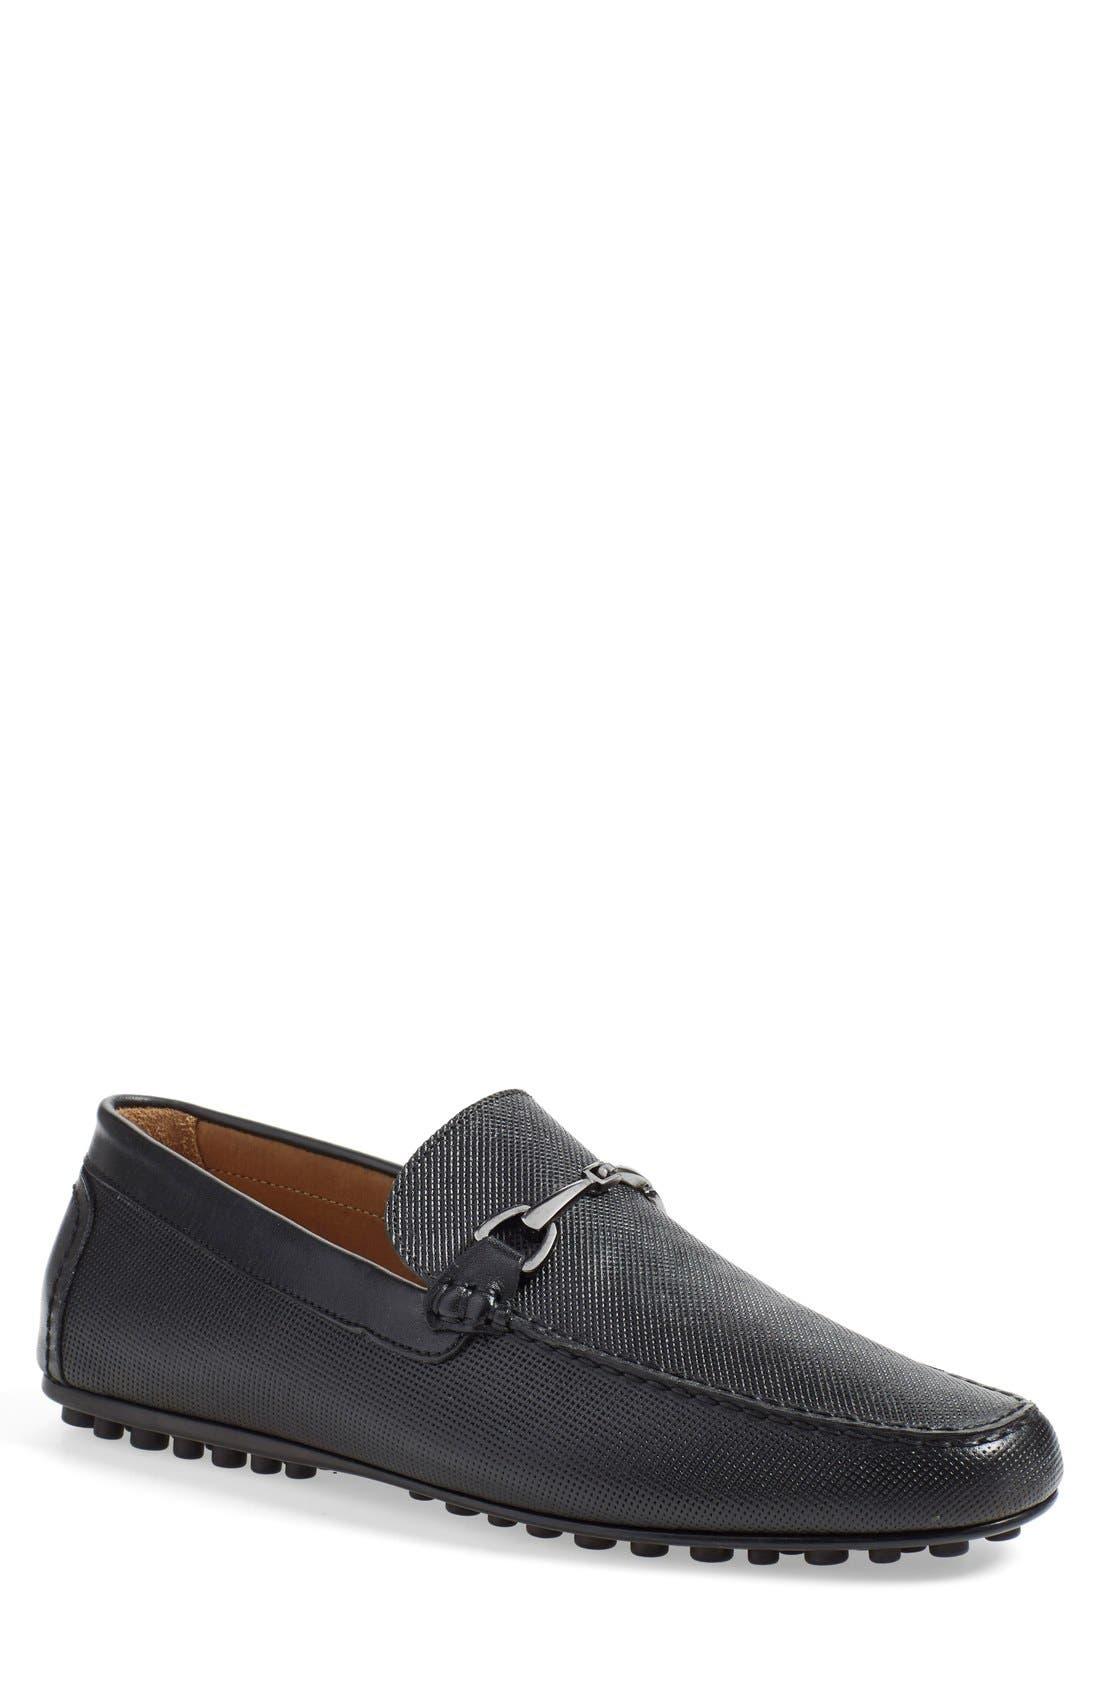 JOHN W. NORDSTROM<SUP>®</SUP> Arco Driving Shoe